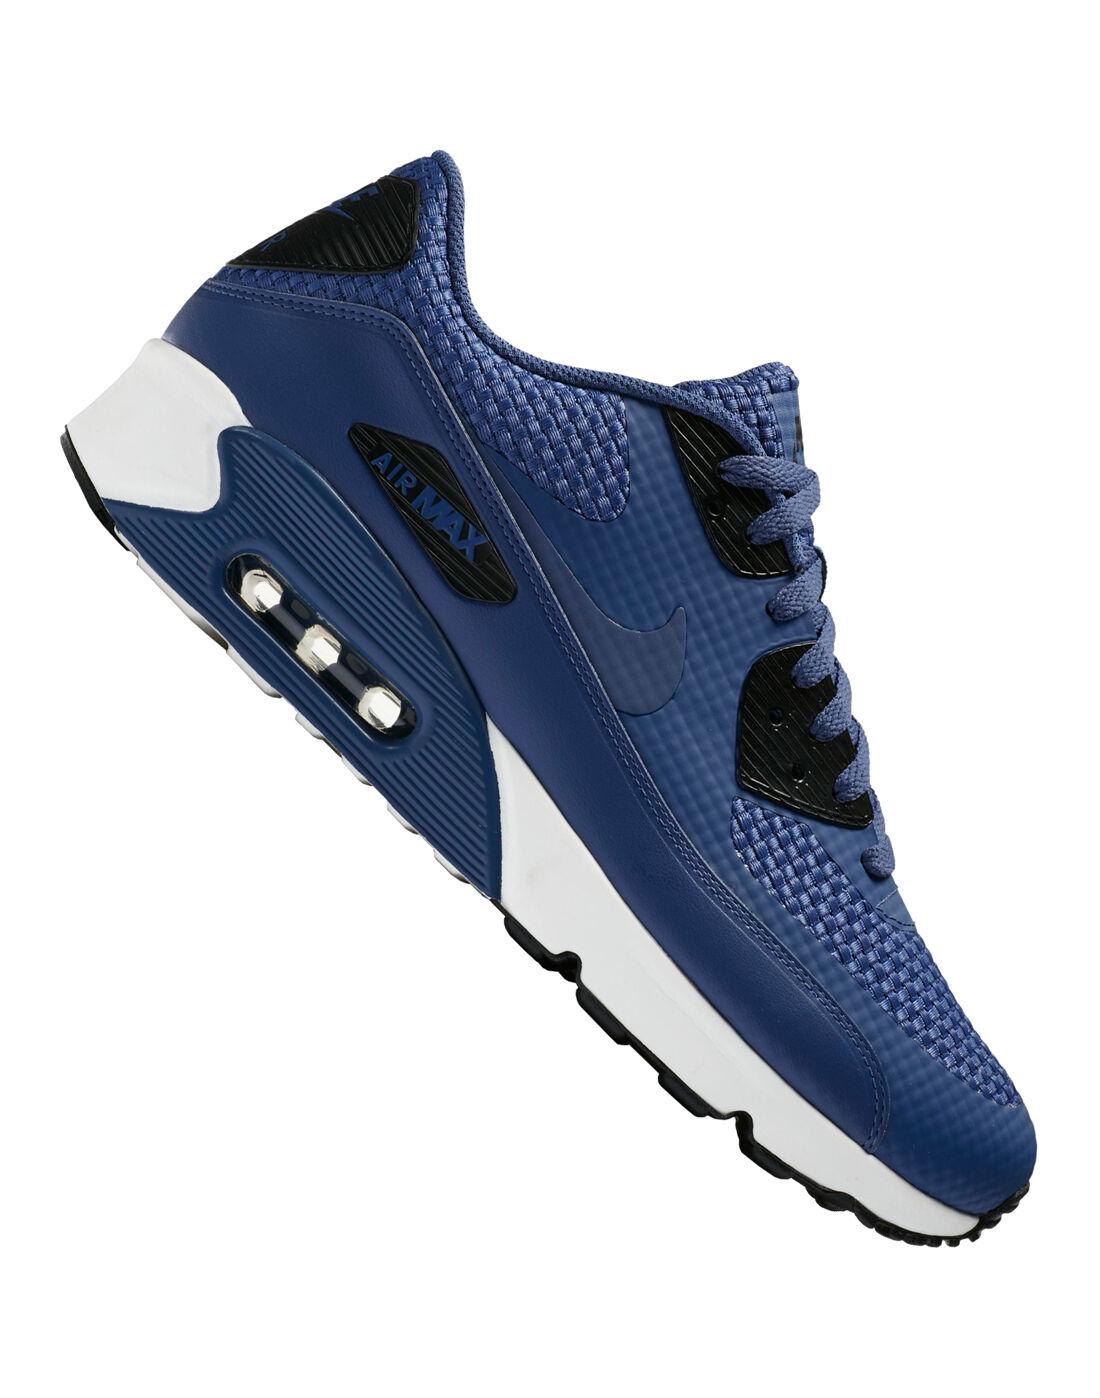 Nike Mens Air Max 90 Ultra 2.0